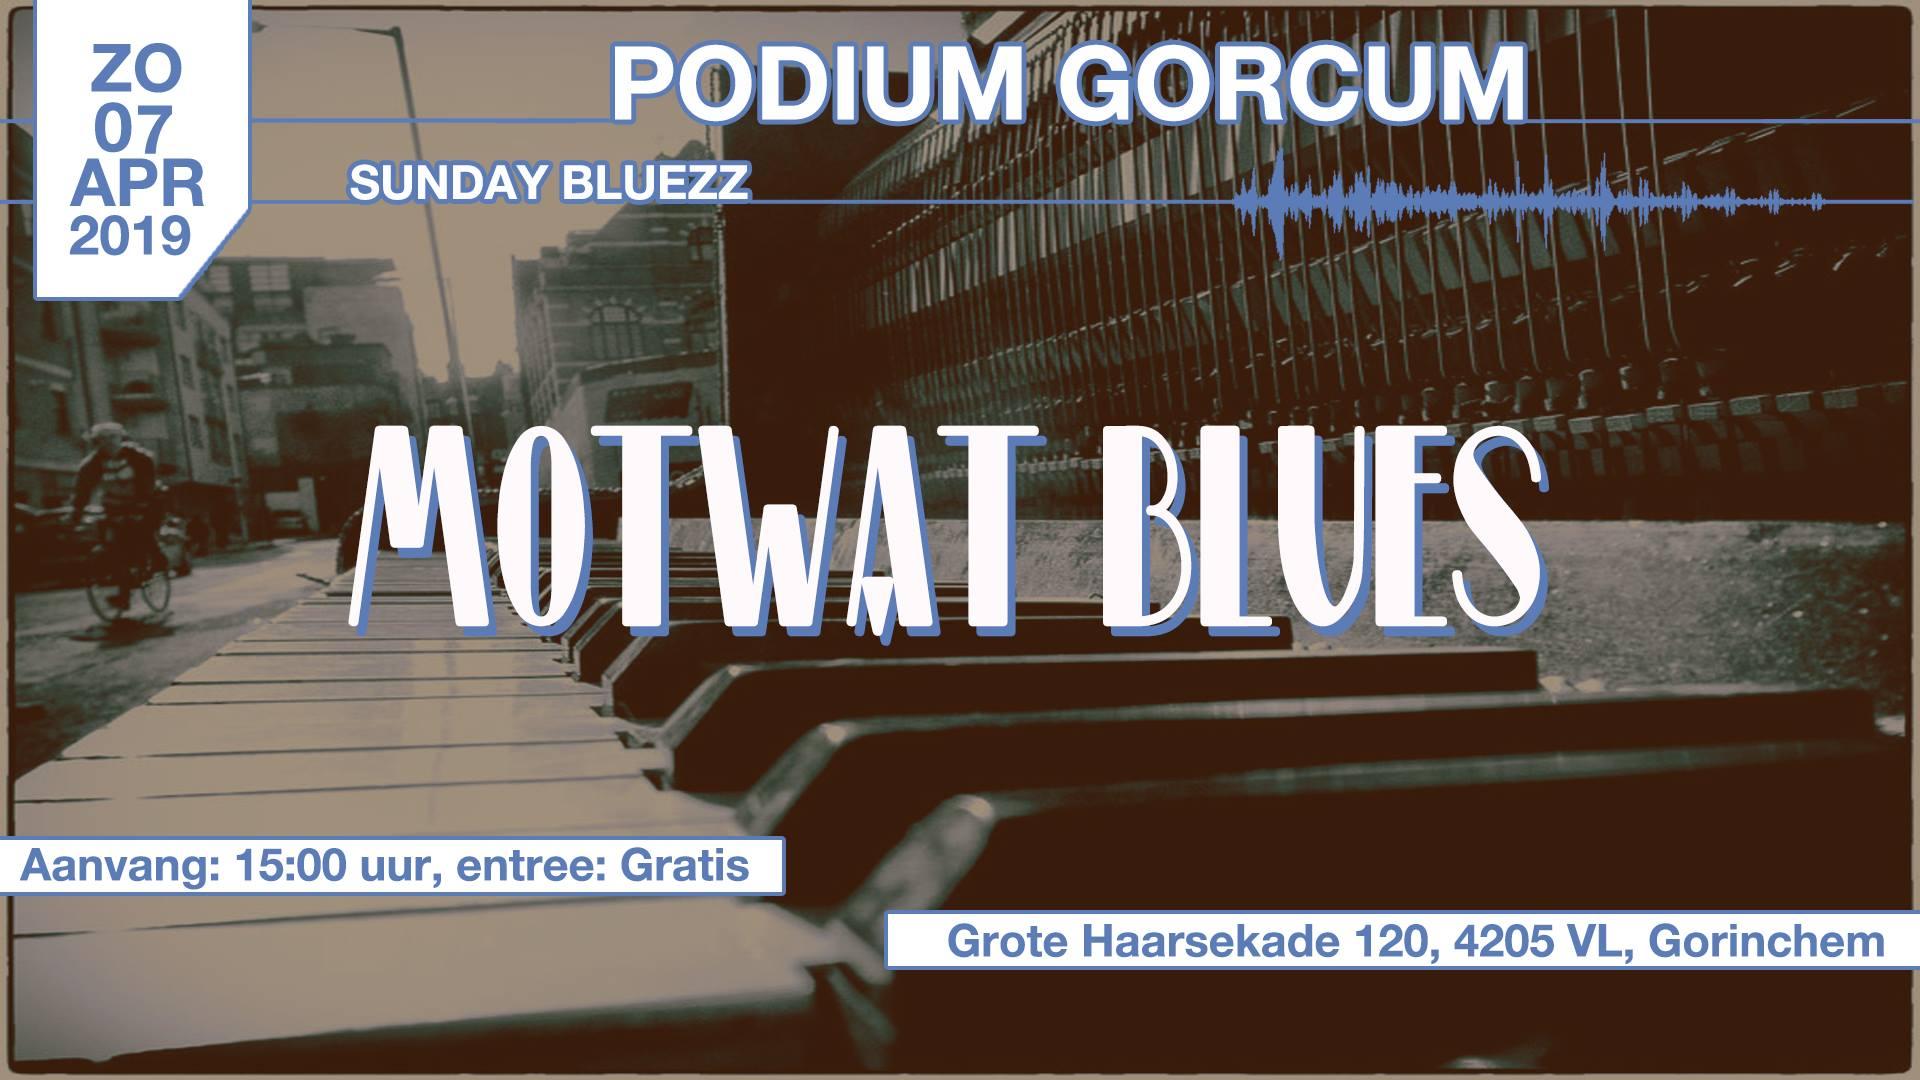 Sunday Bluezz met Mot Wat Bluezz @ Podium Gorcum